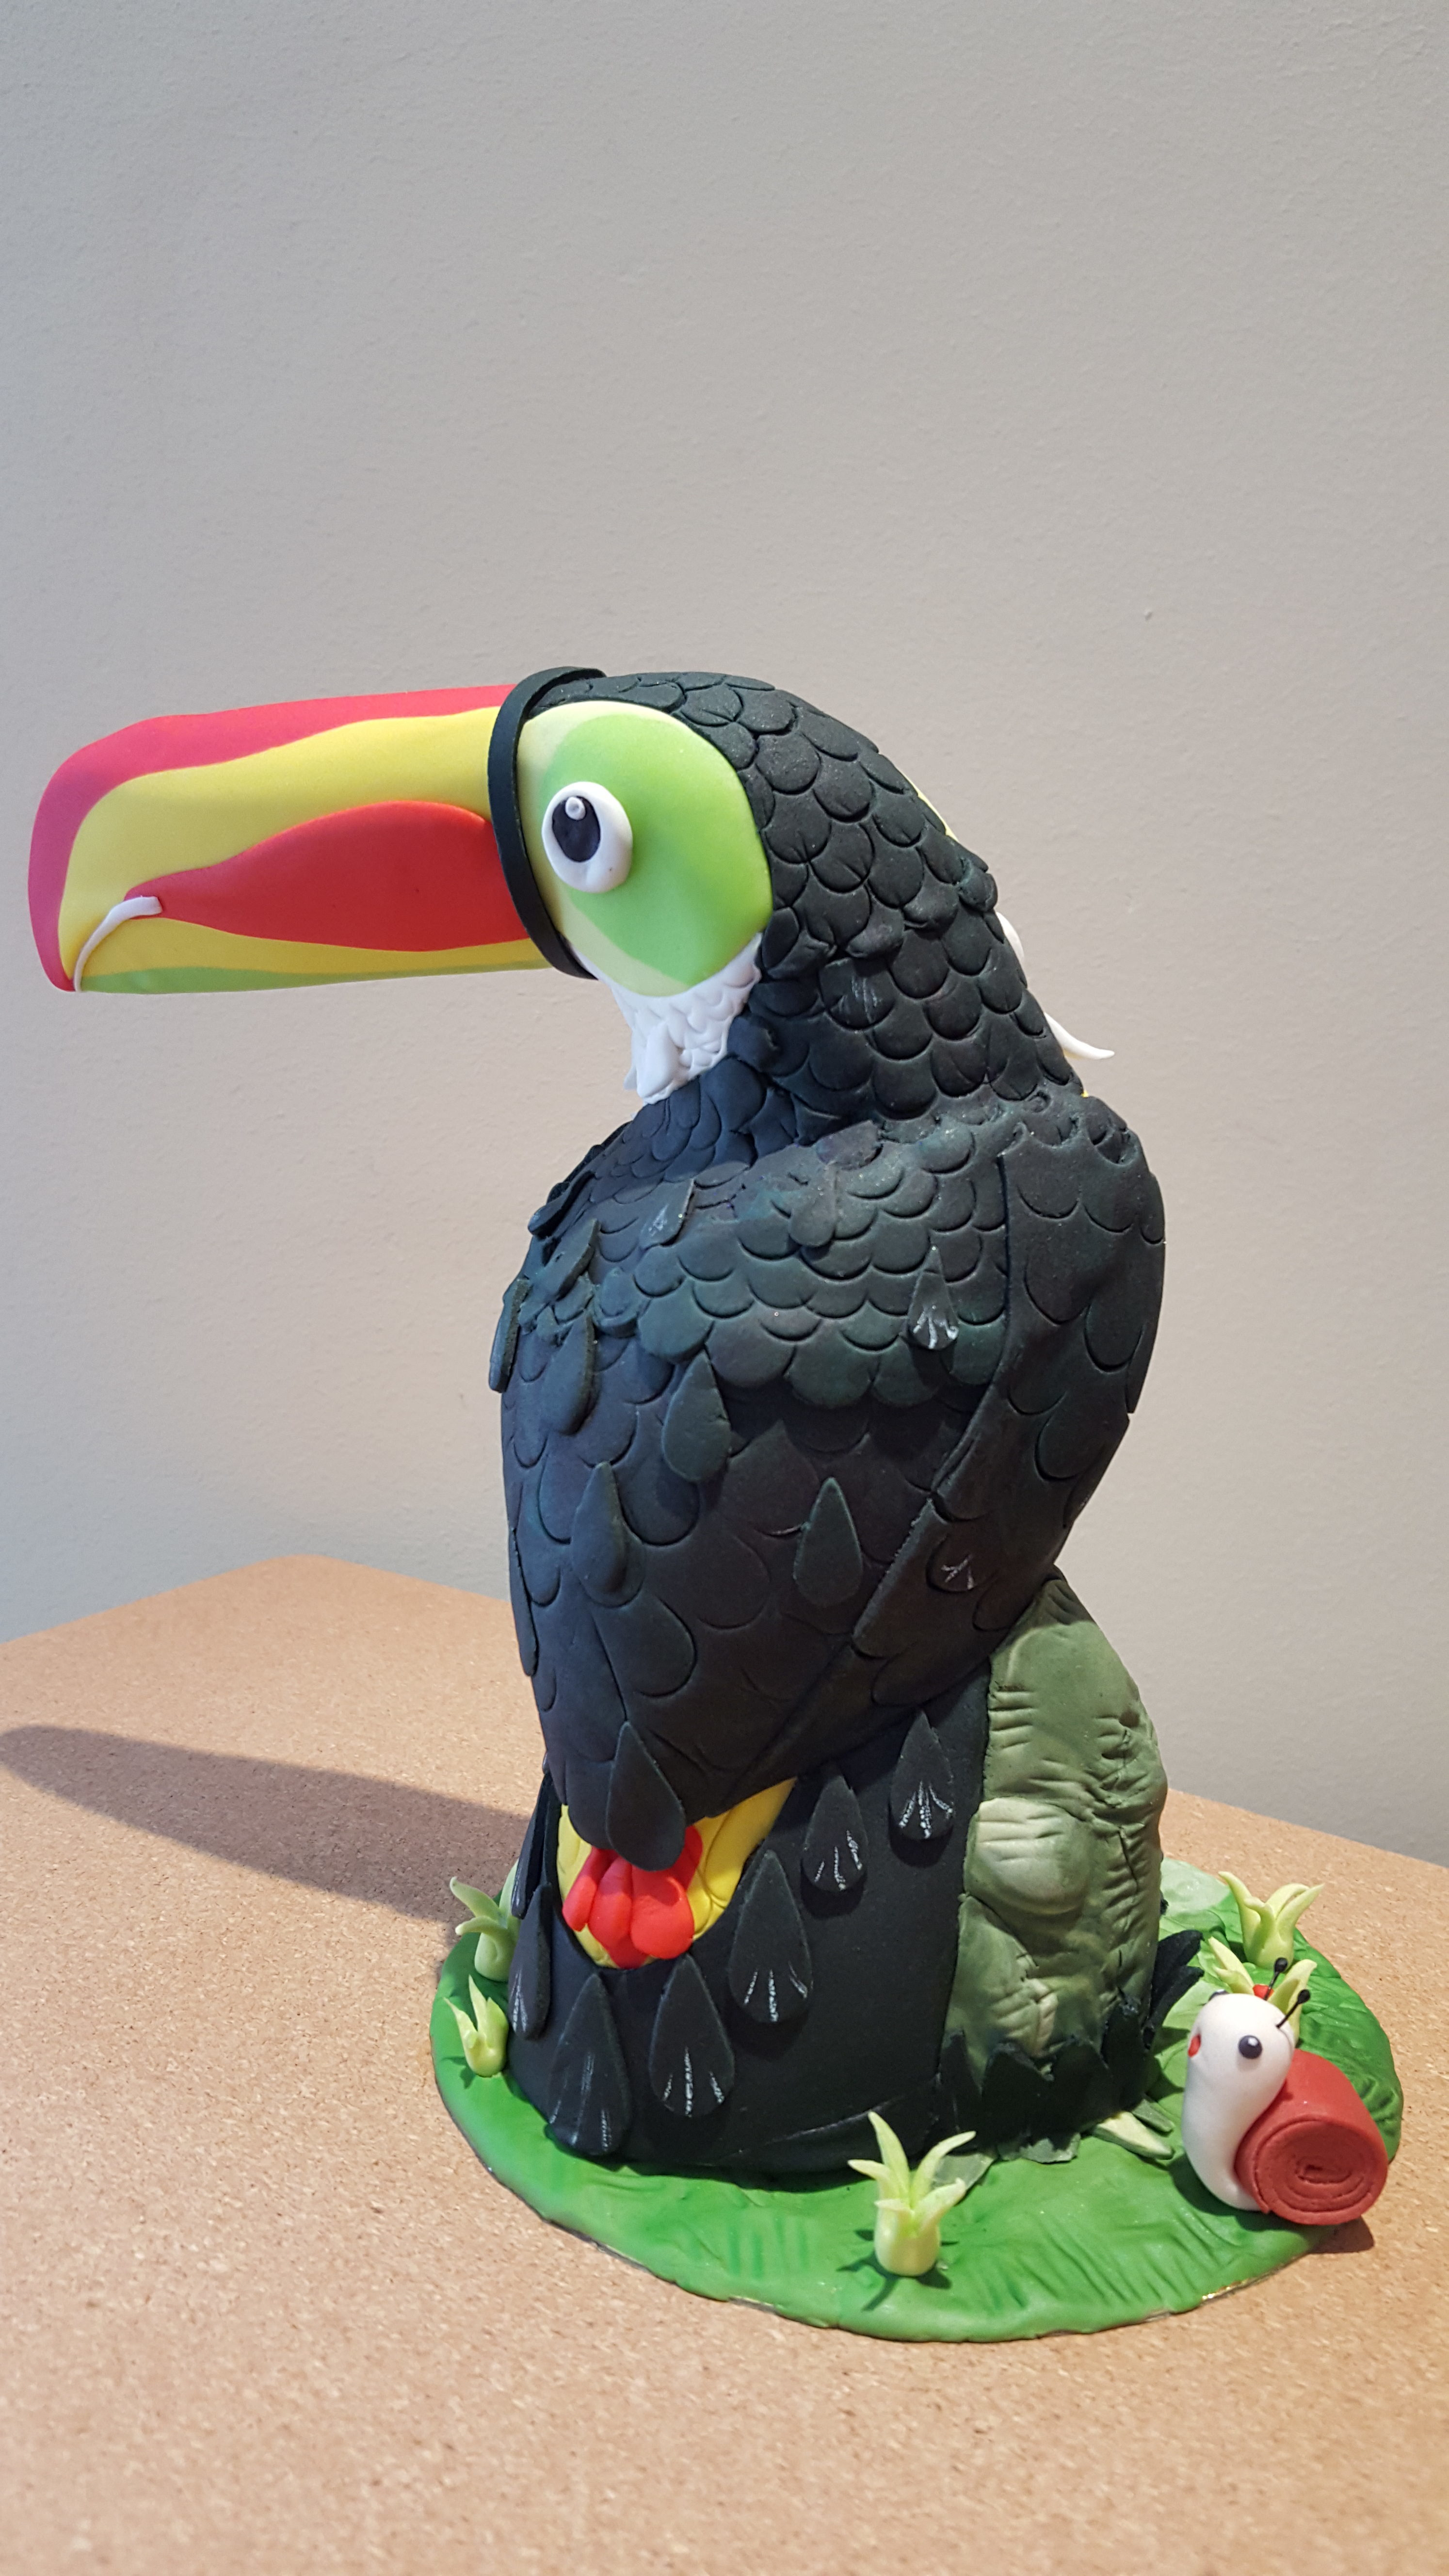 Animal-Rights-Patricia-Ramírez-Moreno-Pat-y-Co.-Candy-Bar-Tucan.jpg#asset:13732